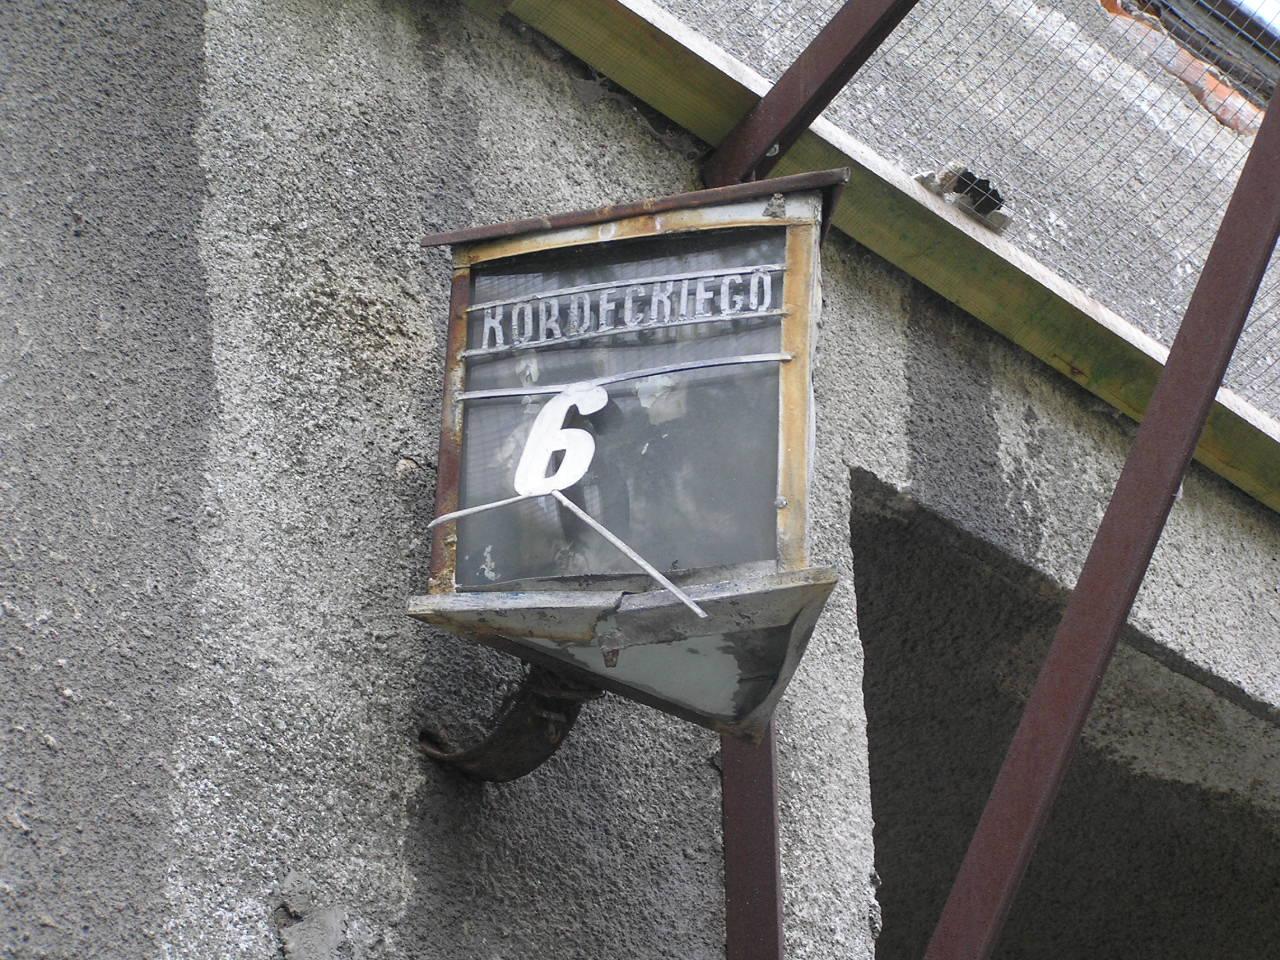 Latarenka adresowa - Kordeckiego 67